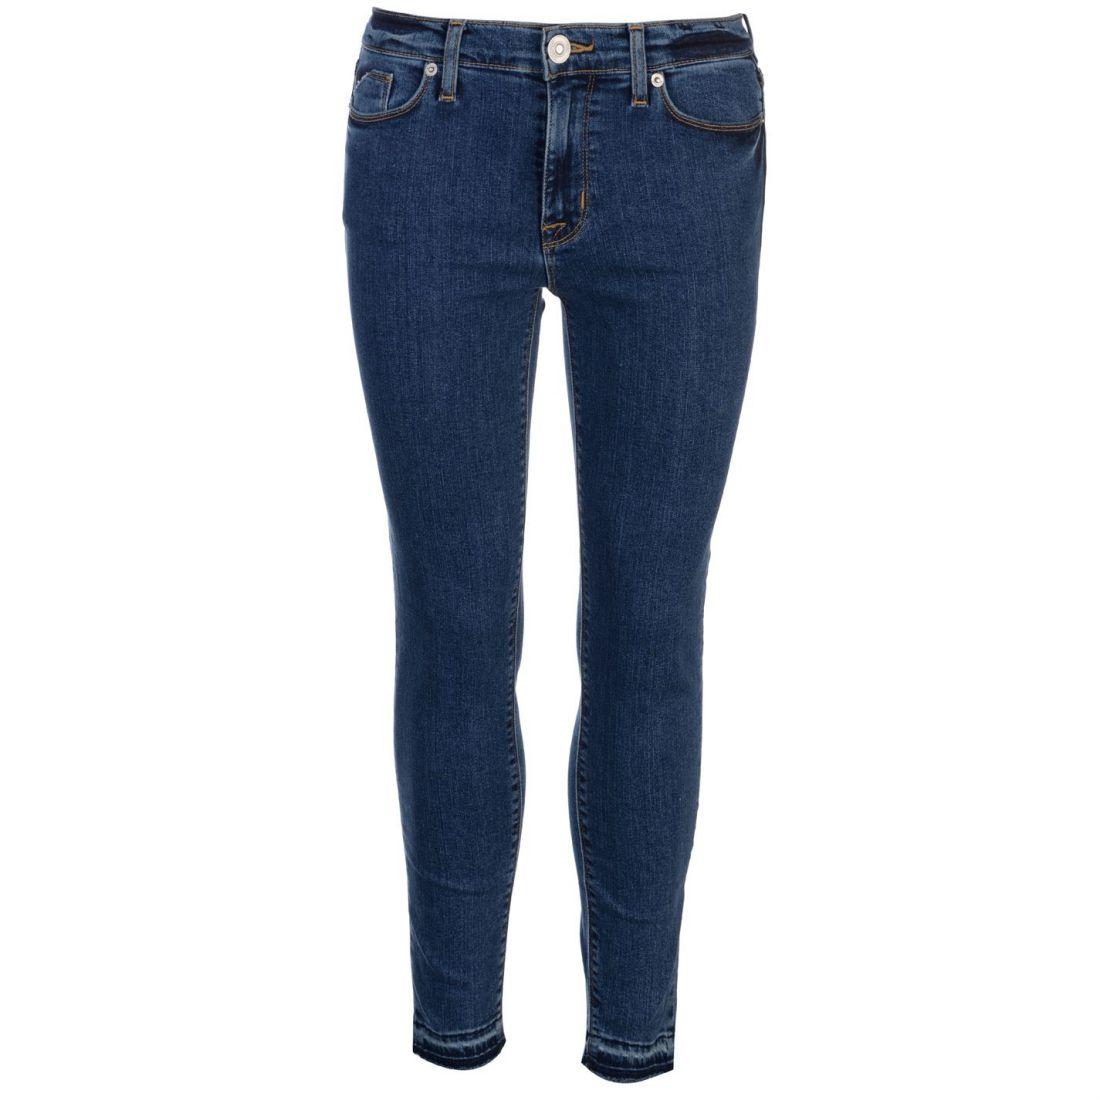 Hudson Jeans Skinny Ladies Pants Trousers Bottoms Zip Fit Distressed